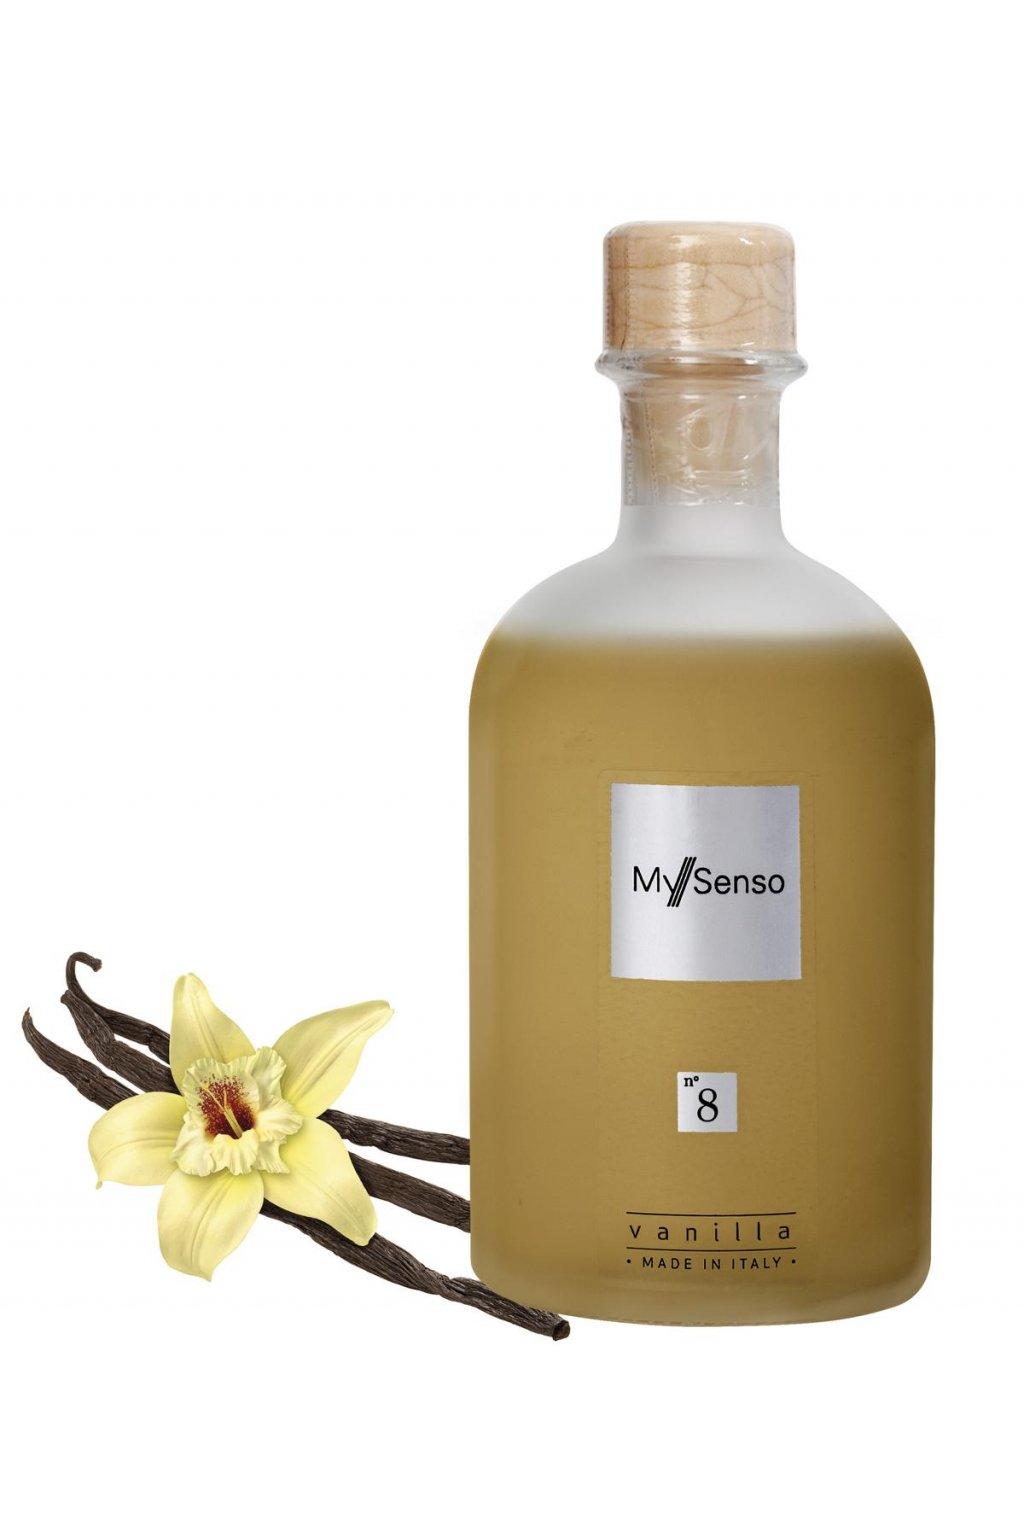 162 my senso nahradni napln pro aromaticky difuzer n 8 vanilla vanilka 240ml